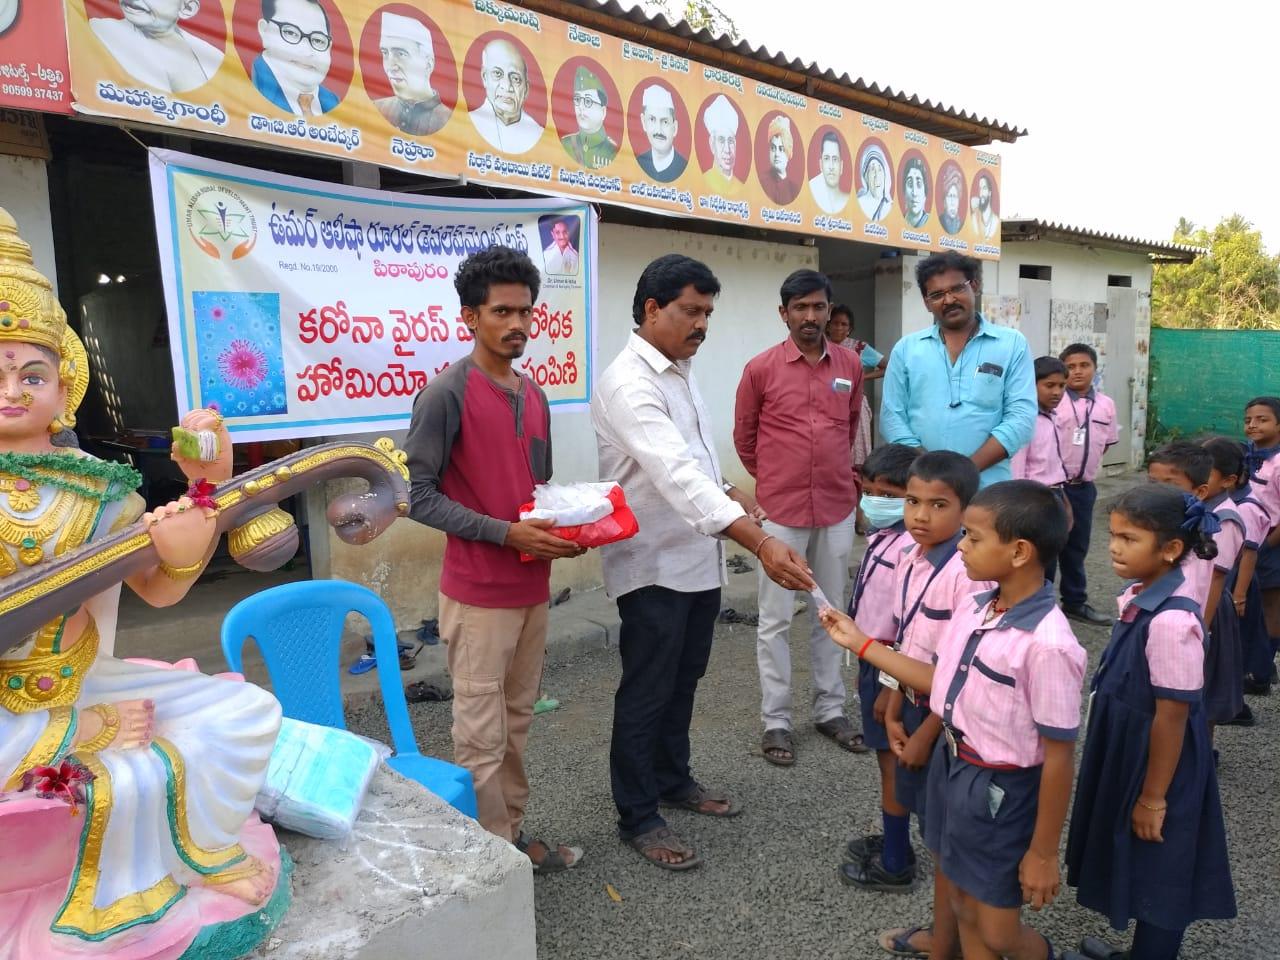 Coronavirus preventive medicine distributed by UARDT at Gowthami English Medium School, Ramachandrapuram on 09-March-2020